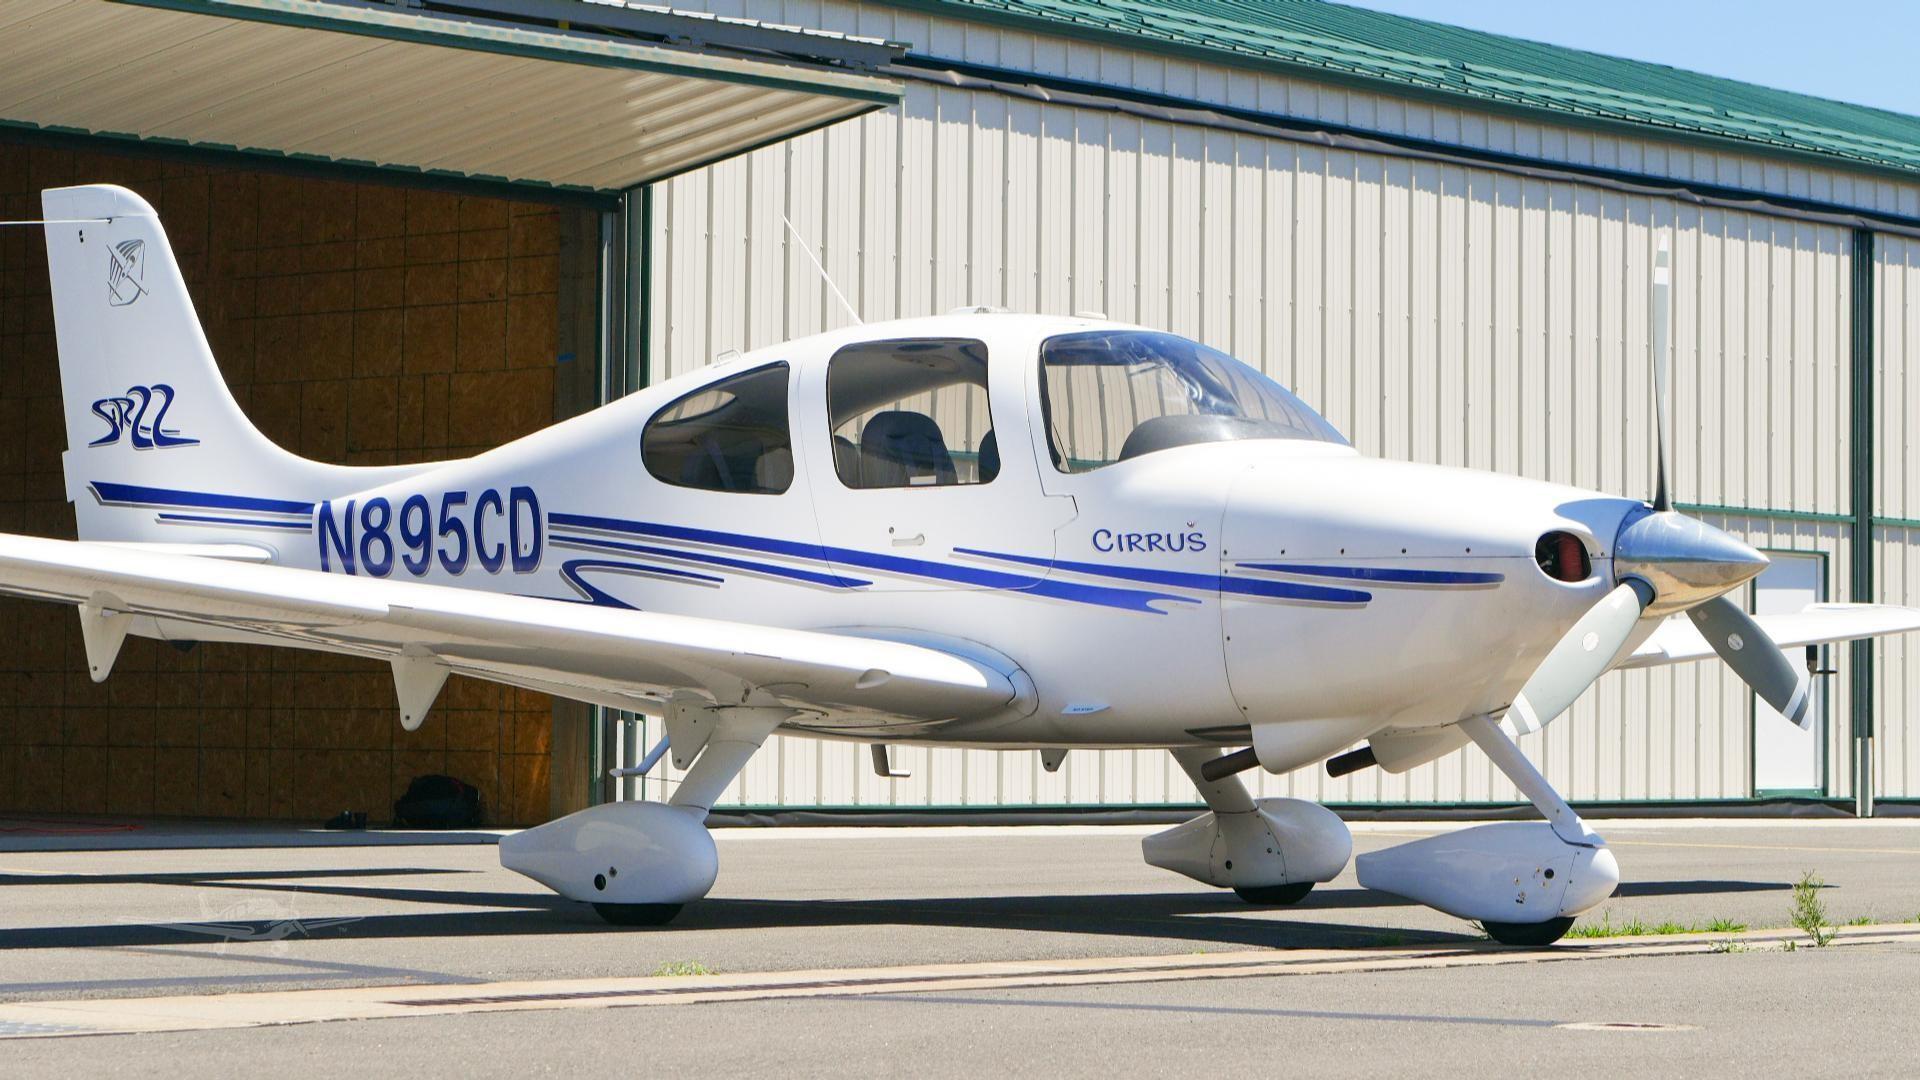 2003 CIRRUS SR22